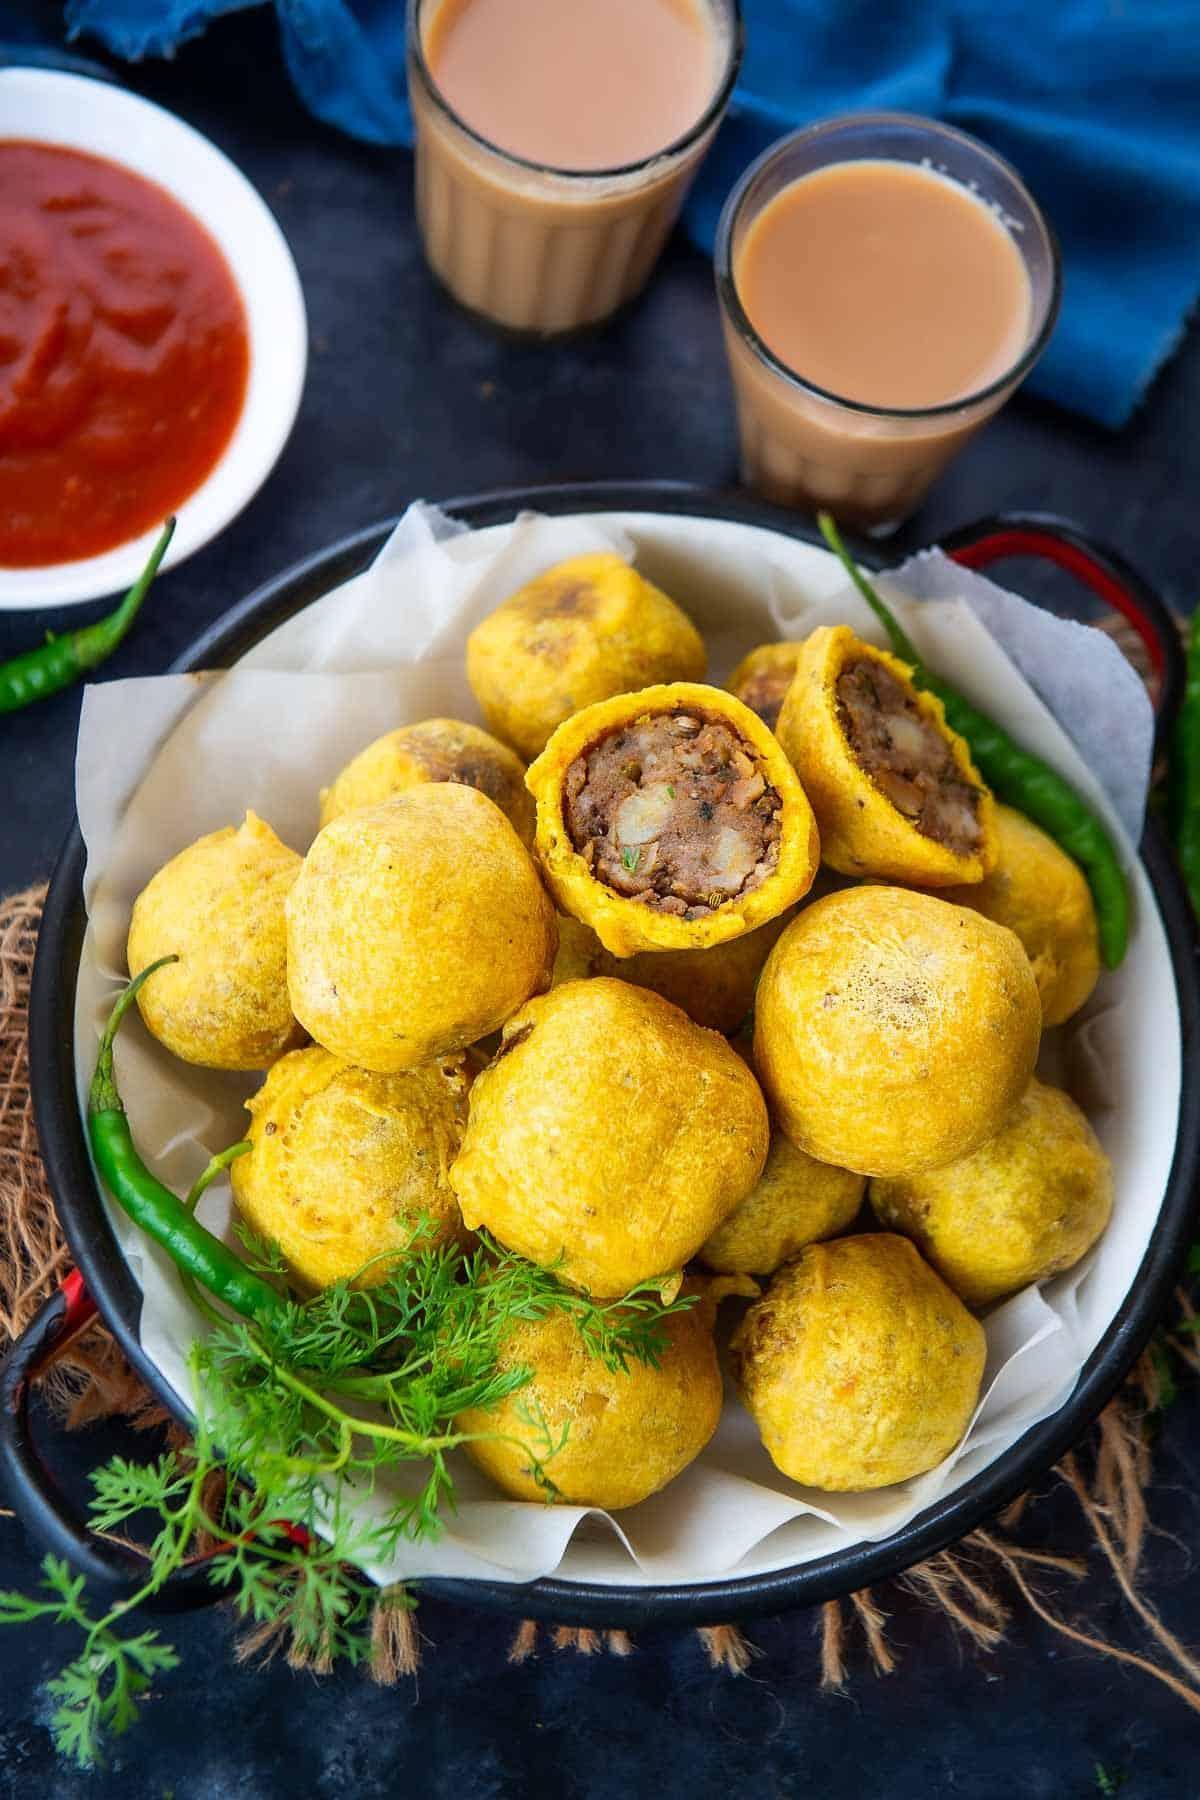 Batata Vada served on a plate.